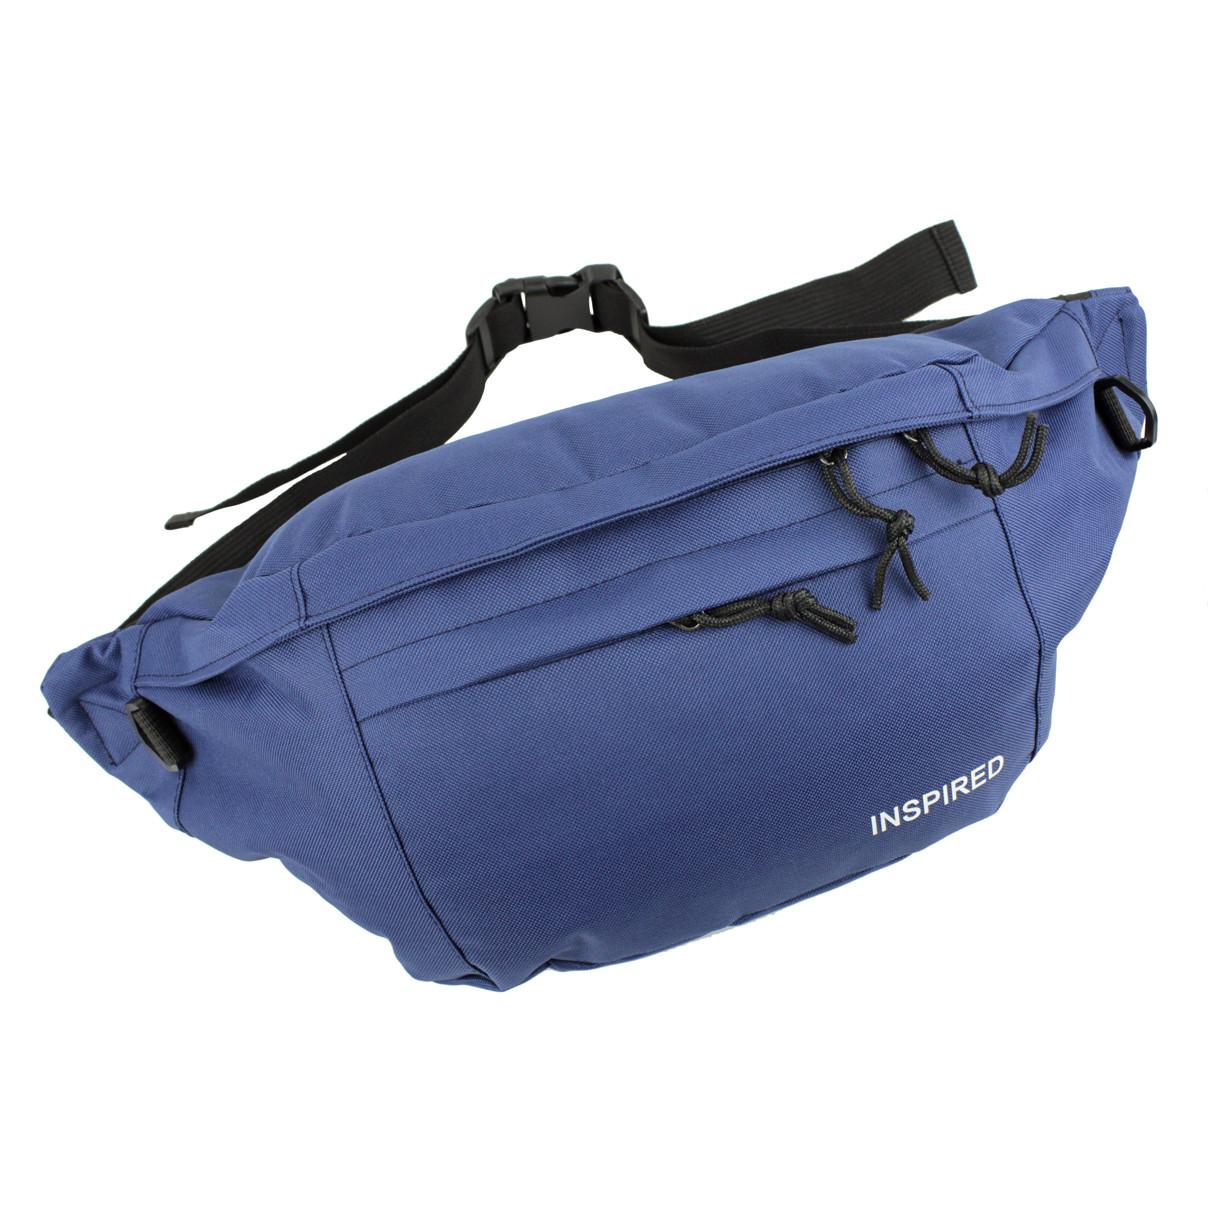 Поясная сумка-бананка текстильная унисекс INSPIRED Синяя